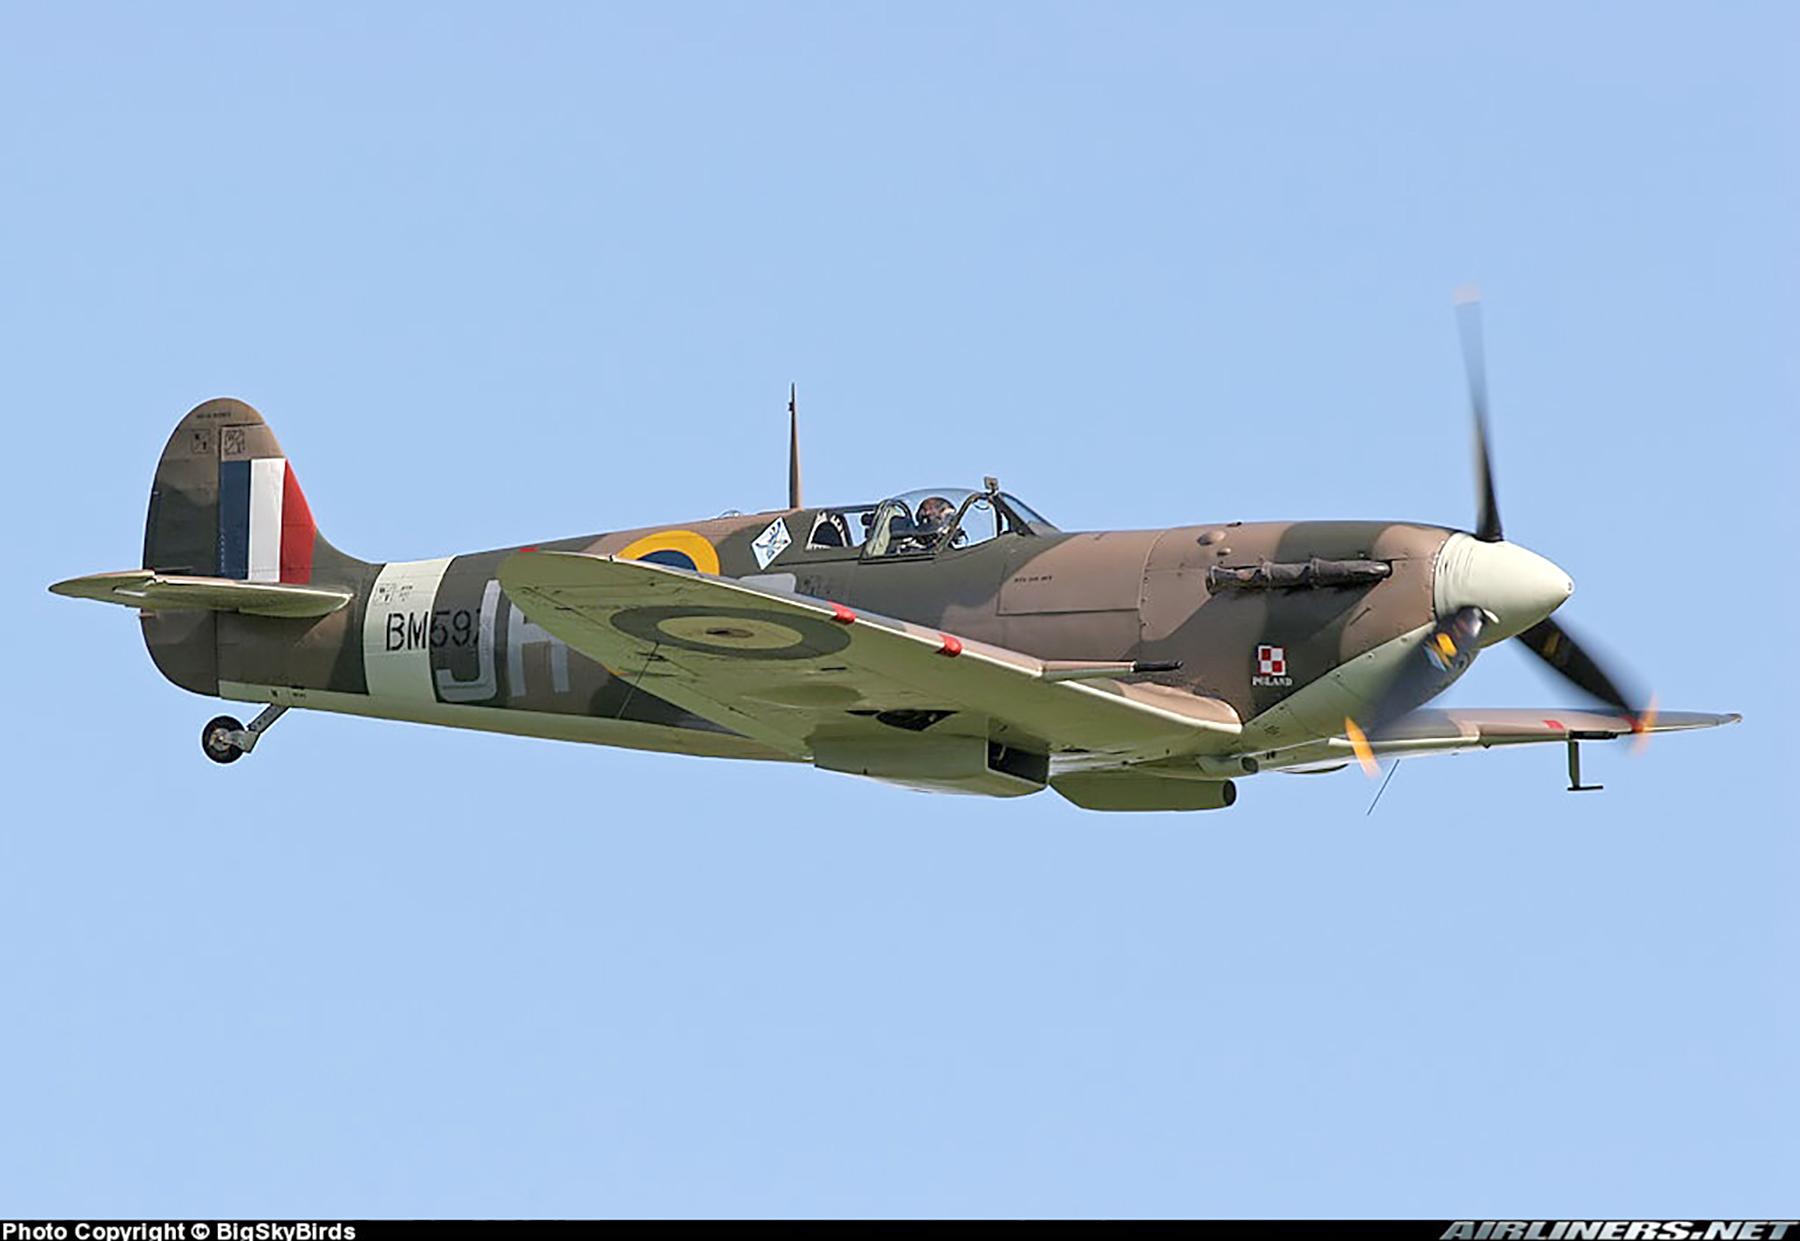 Airworthy Spitfire warbird MkVb RAF 317Sqn JHC BM597 G MKVB 15